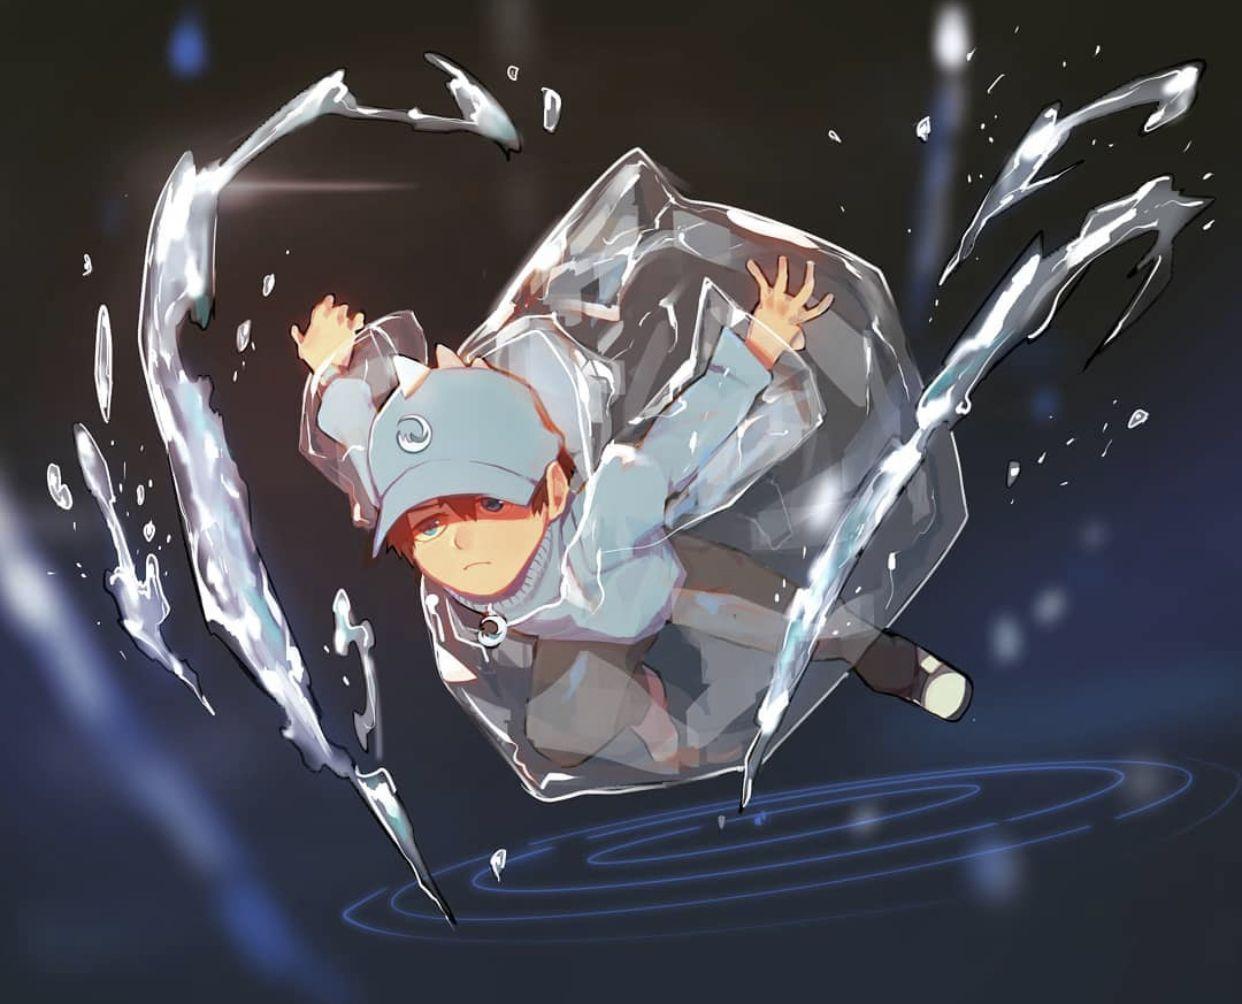 Ghim của Himebami Yumeria trên boboiboy anime trong 2020